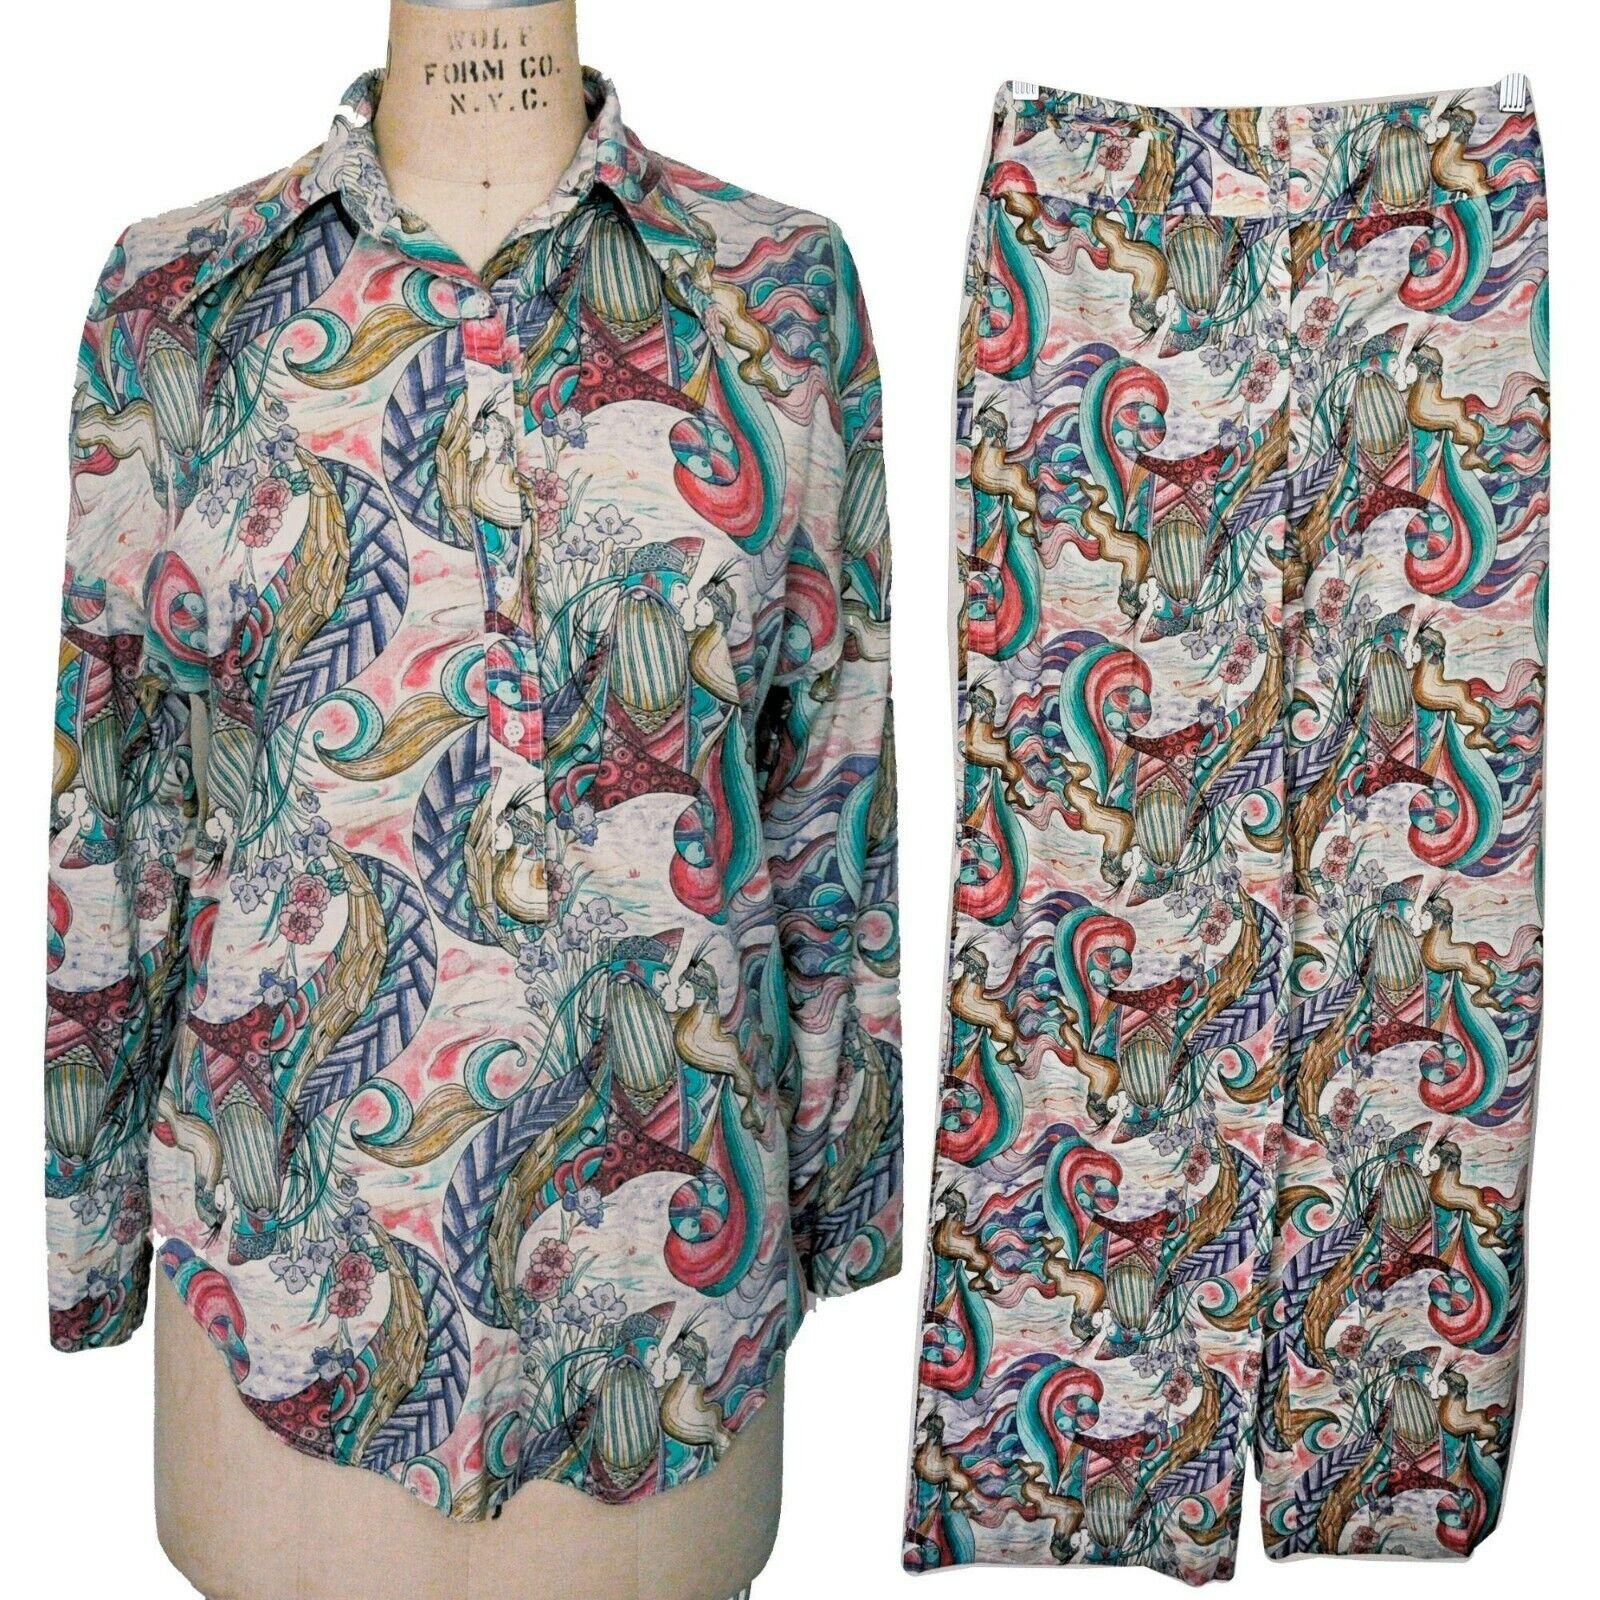 Vintage 70s Novelty Fantasy Print Shirt Pants Set… - image 1